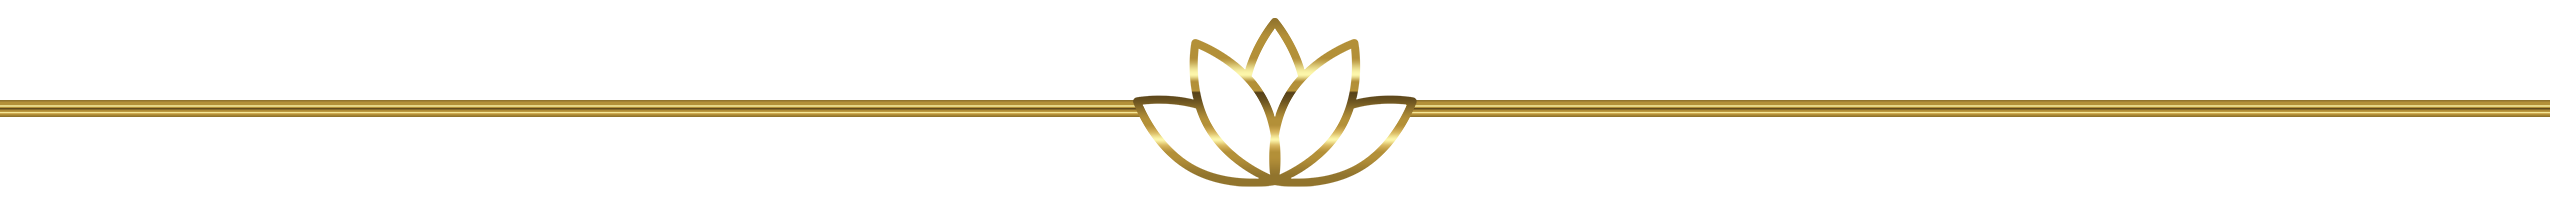 Gold Lotus Horizontal Divider